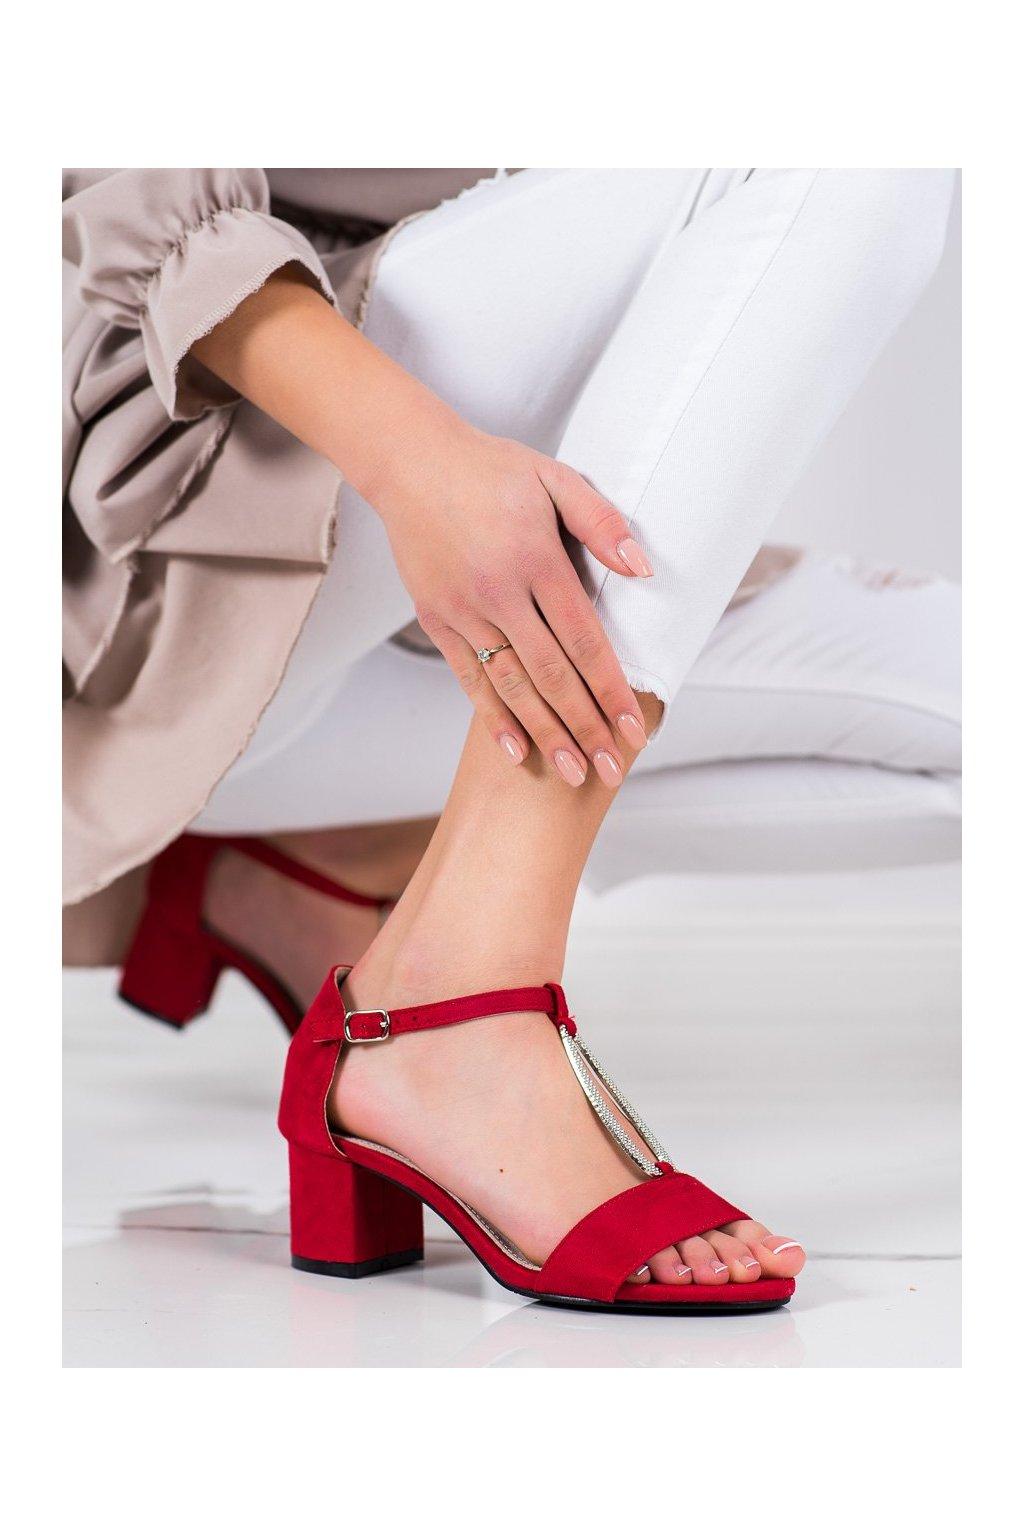 Červené sandále Goodin kod GD-FL1027R